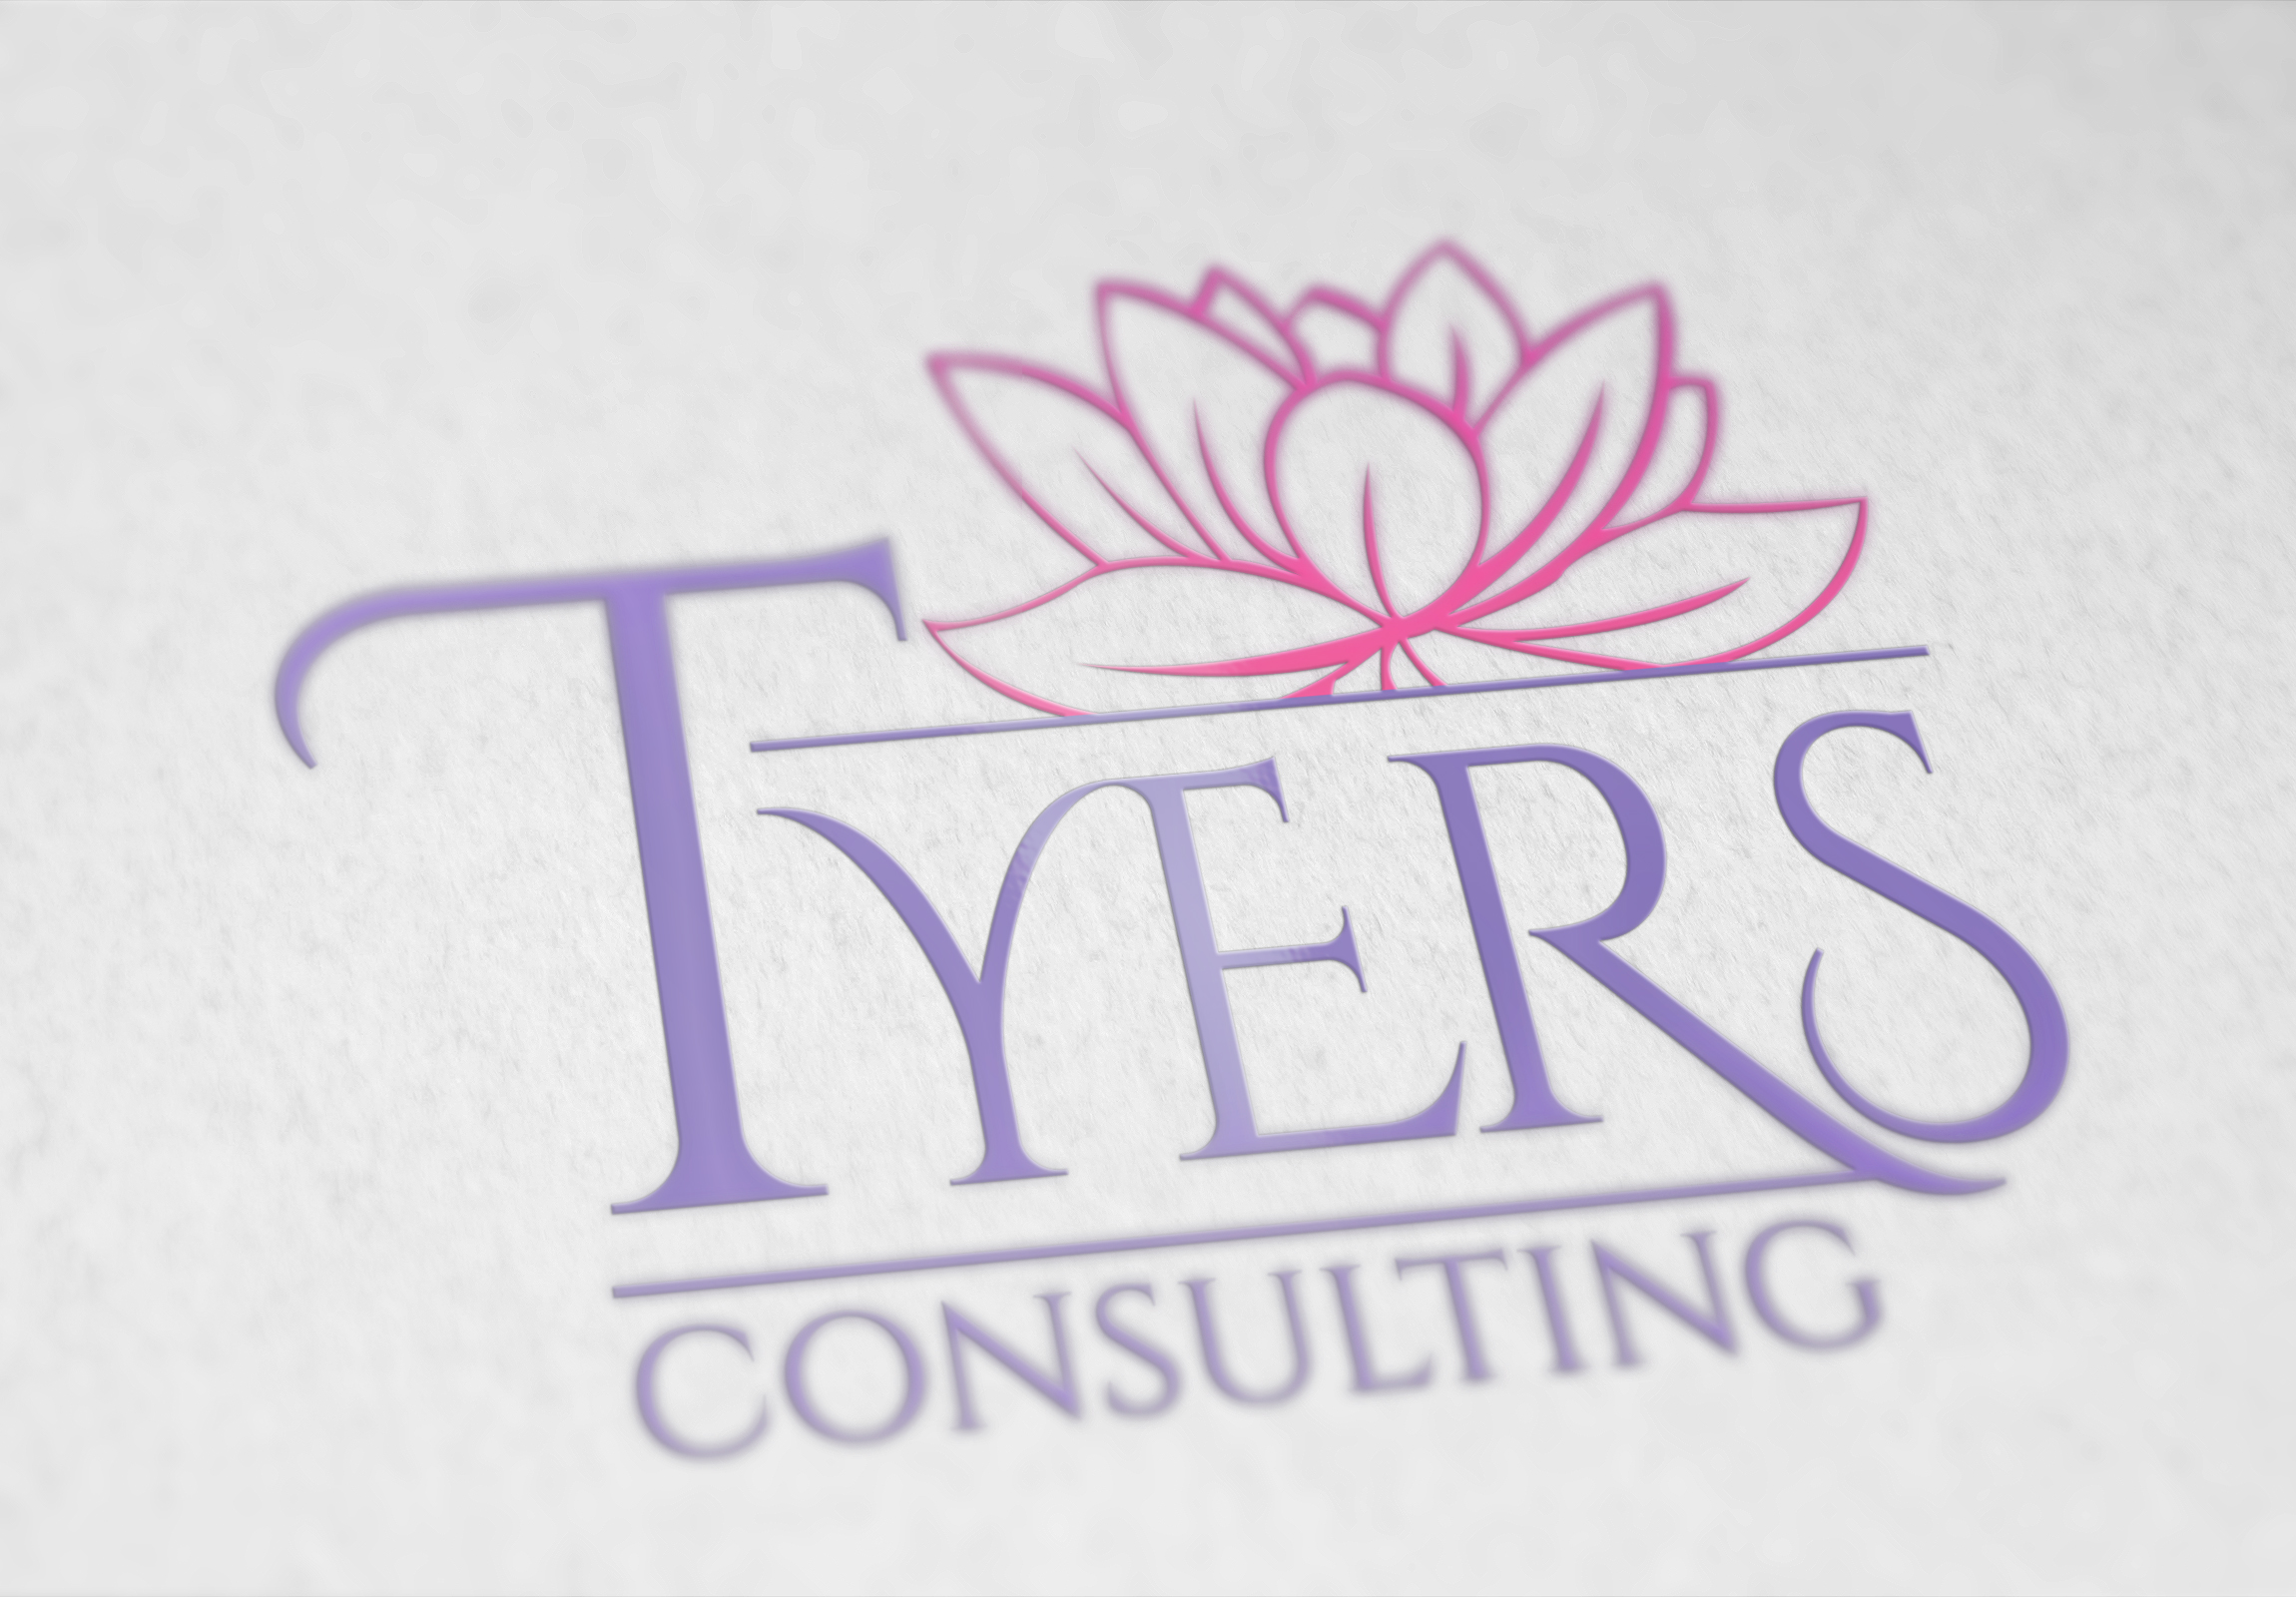 tyers_logo-Colormockup.jpg